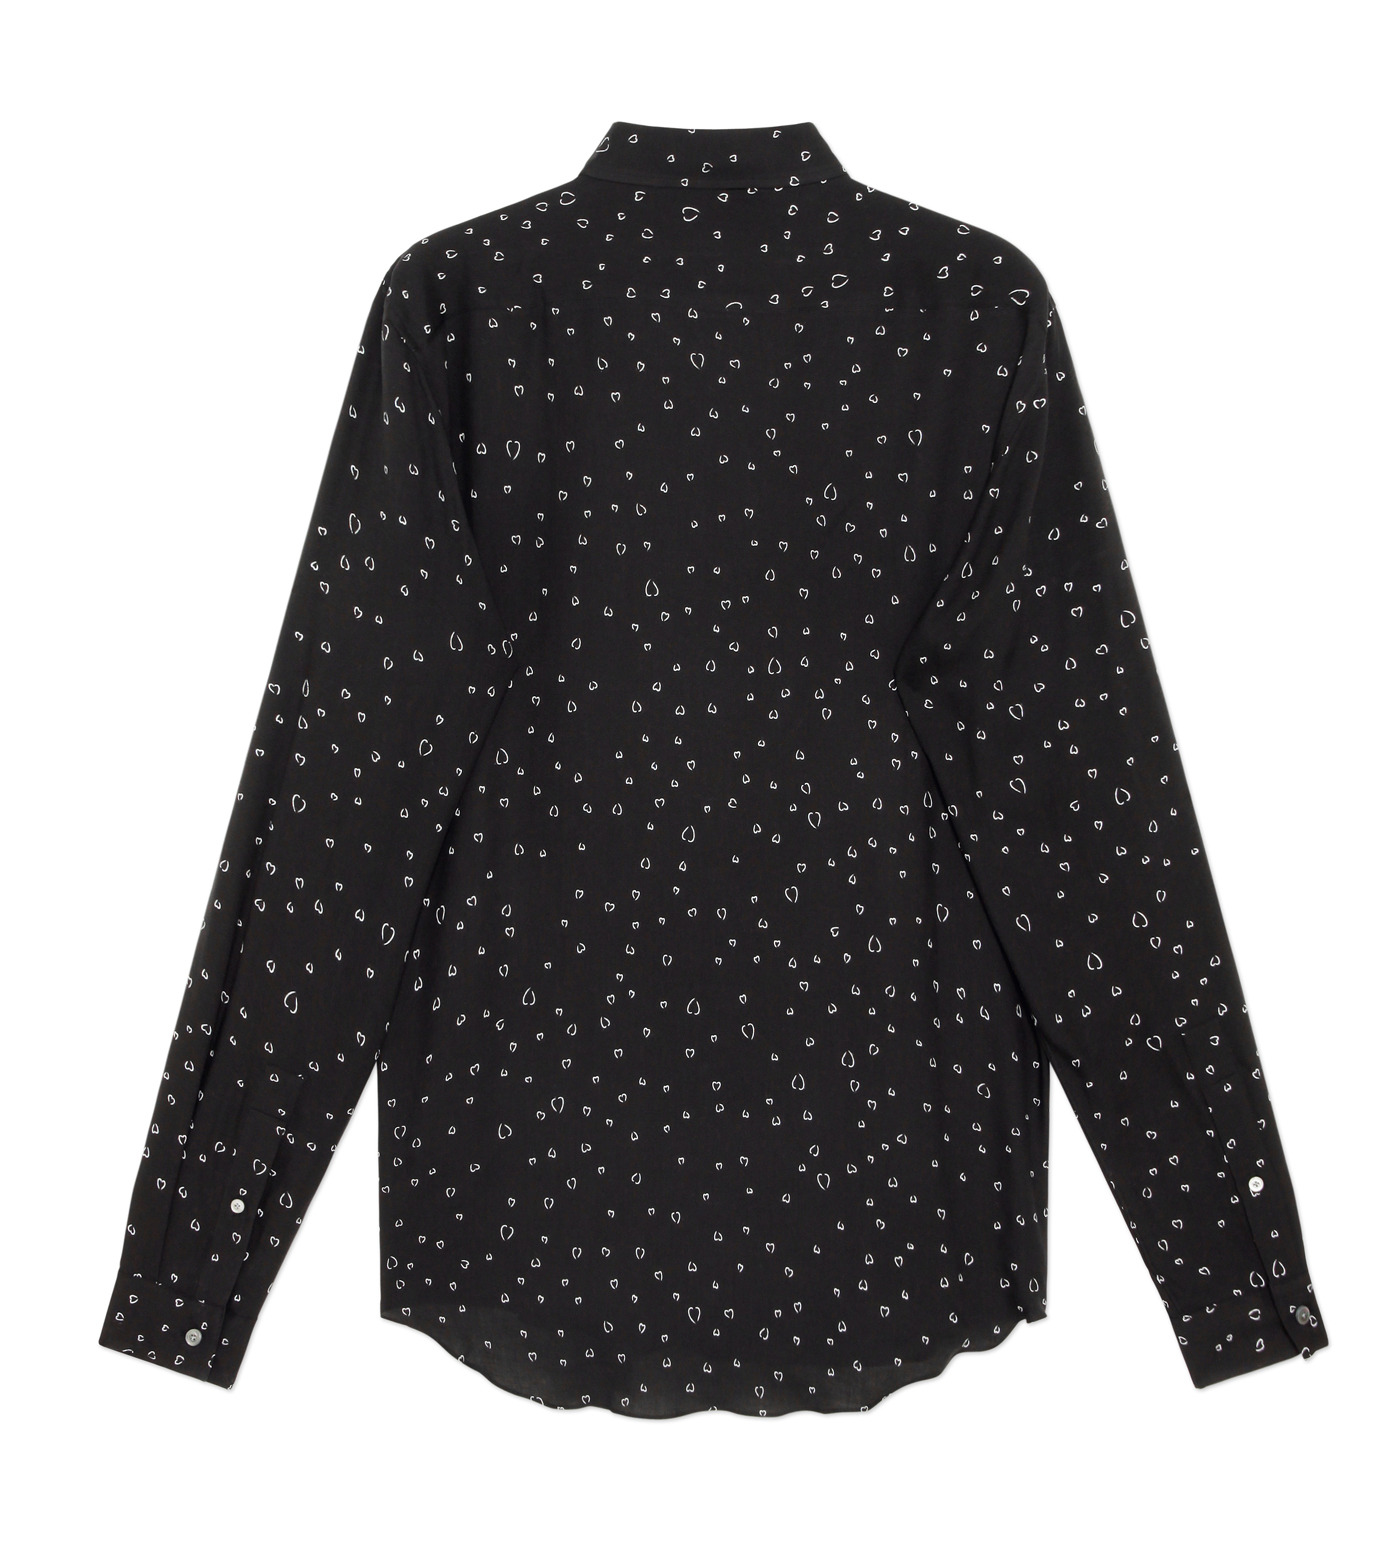 HL HEDDIE LOVU(エイチエル・エディールーヴ)のLINE HEART PATTERN SHIRT-BLACK(シャツ/shirt)-18S93002-13 拡大詳細画像2